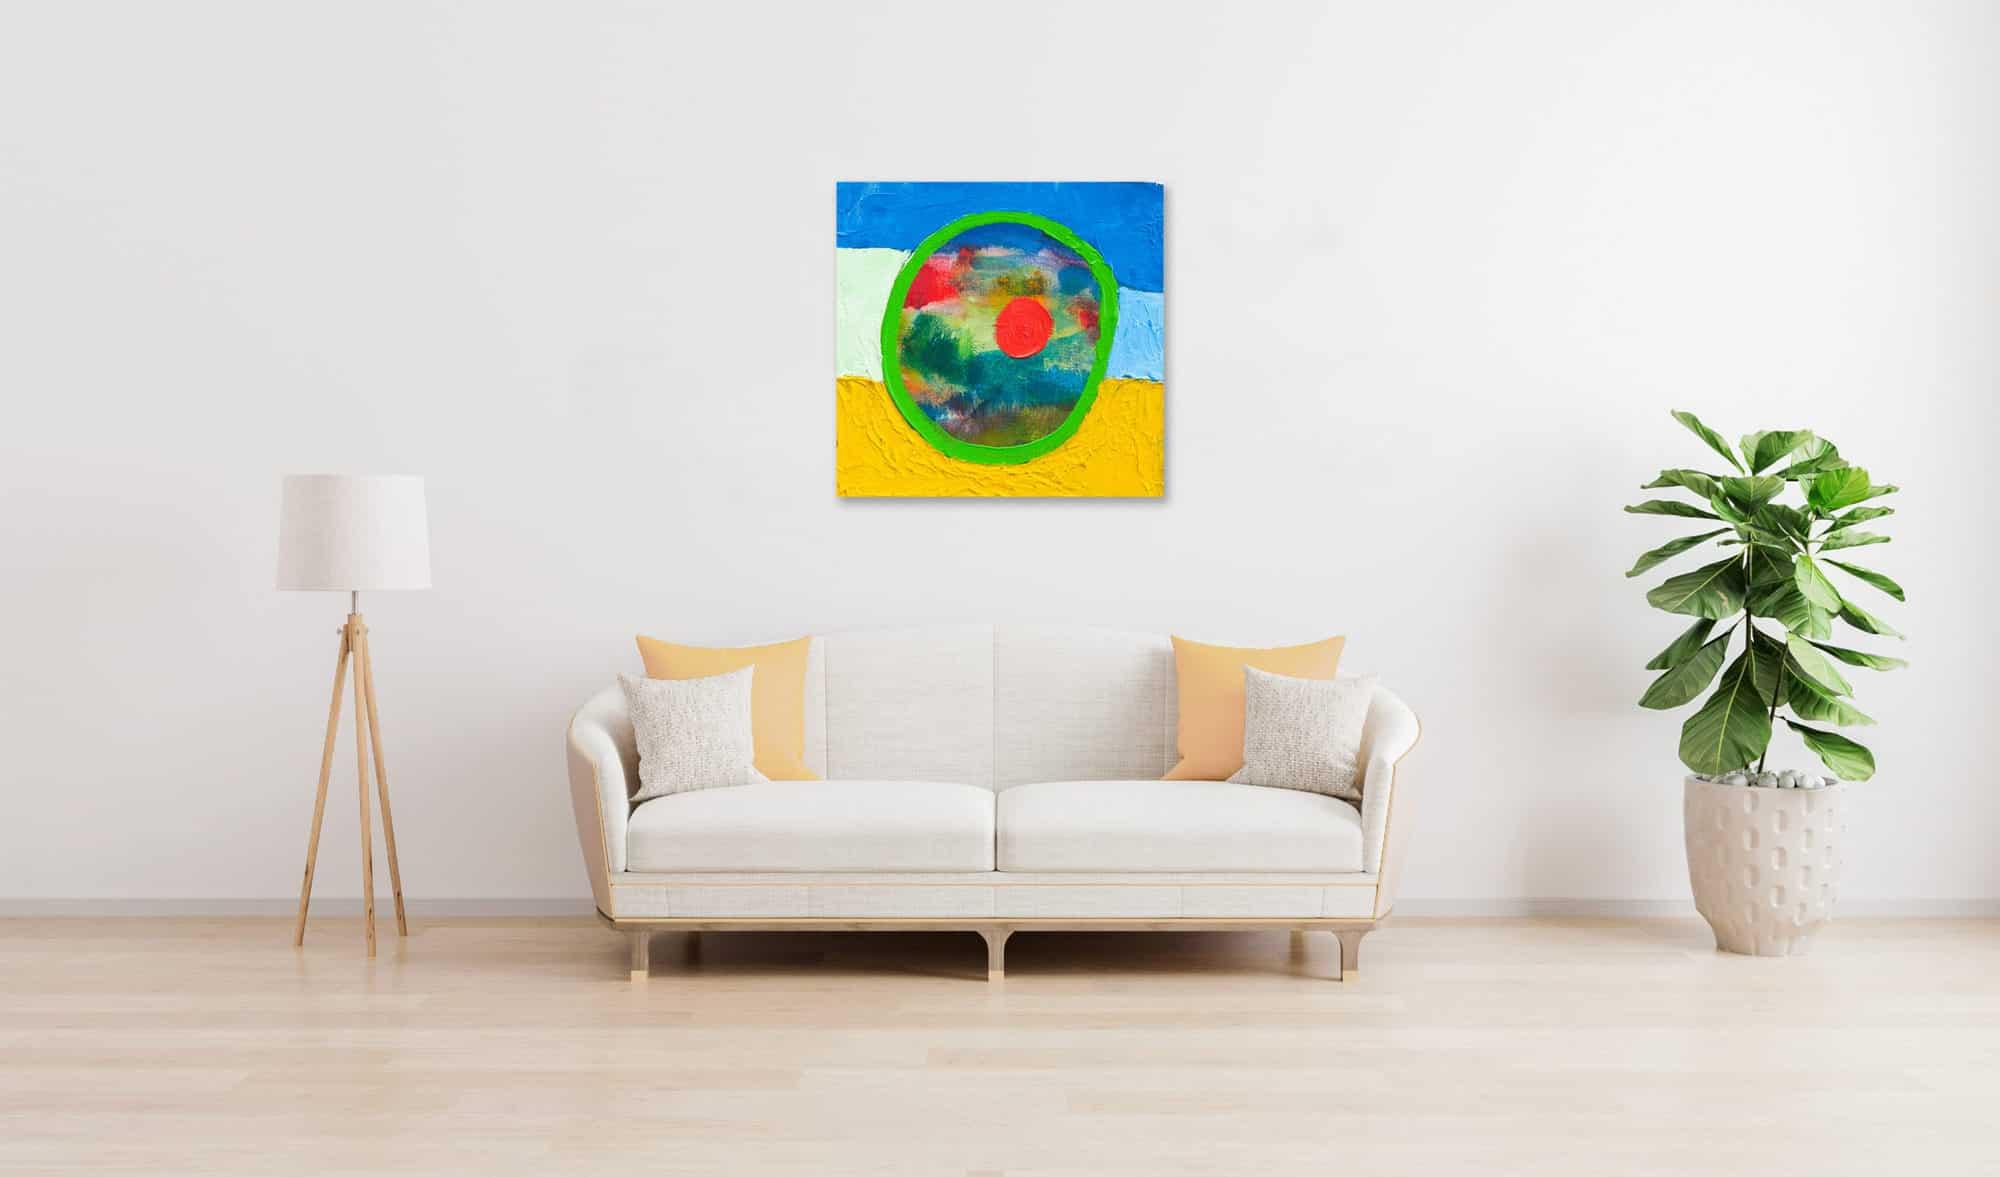 Acrylbild abstrakt expressiv roter Punkt wandbild